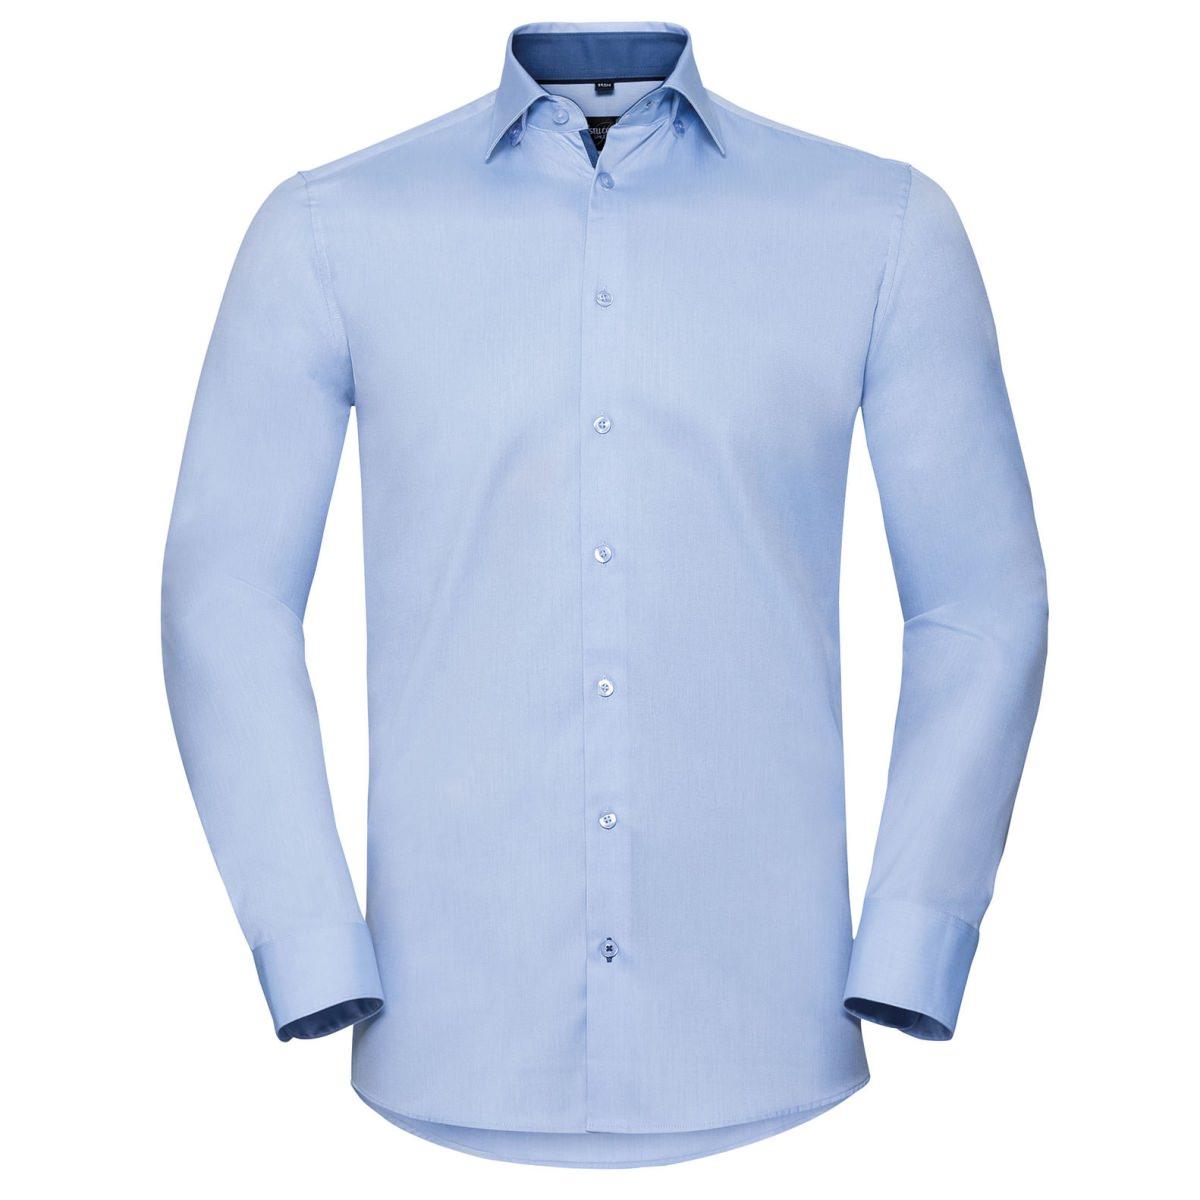 Tailliertes Herringbone Kontrast-Hemd - Langarm